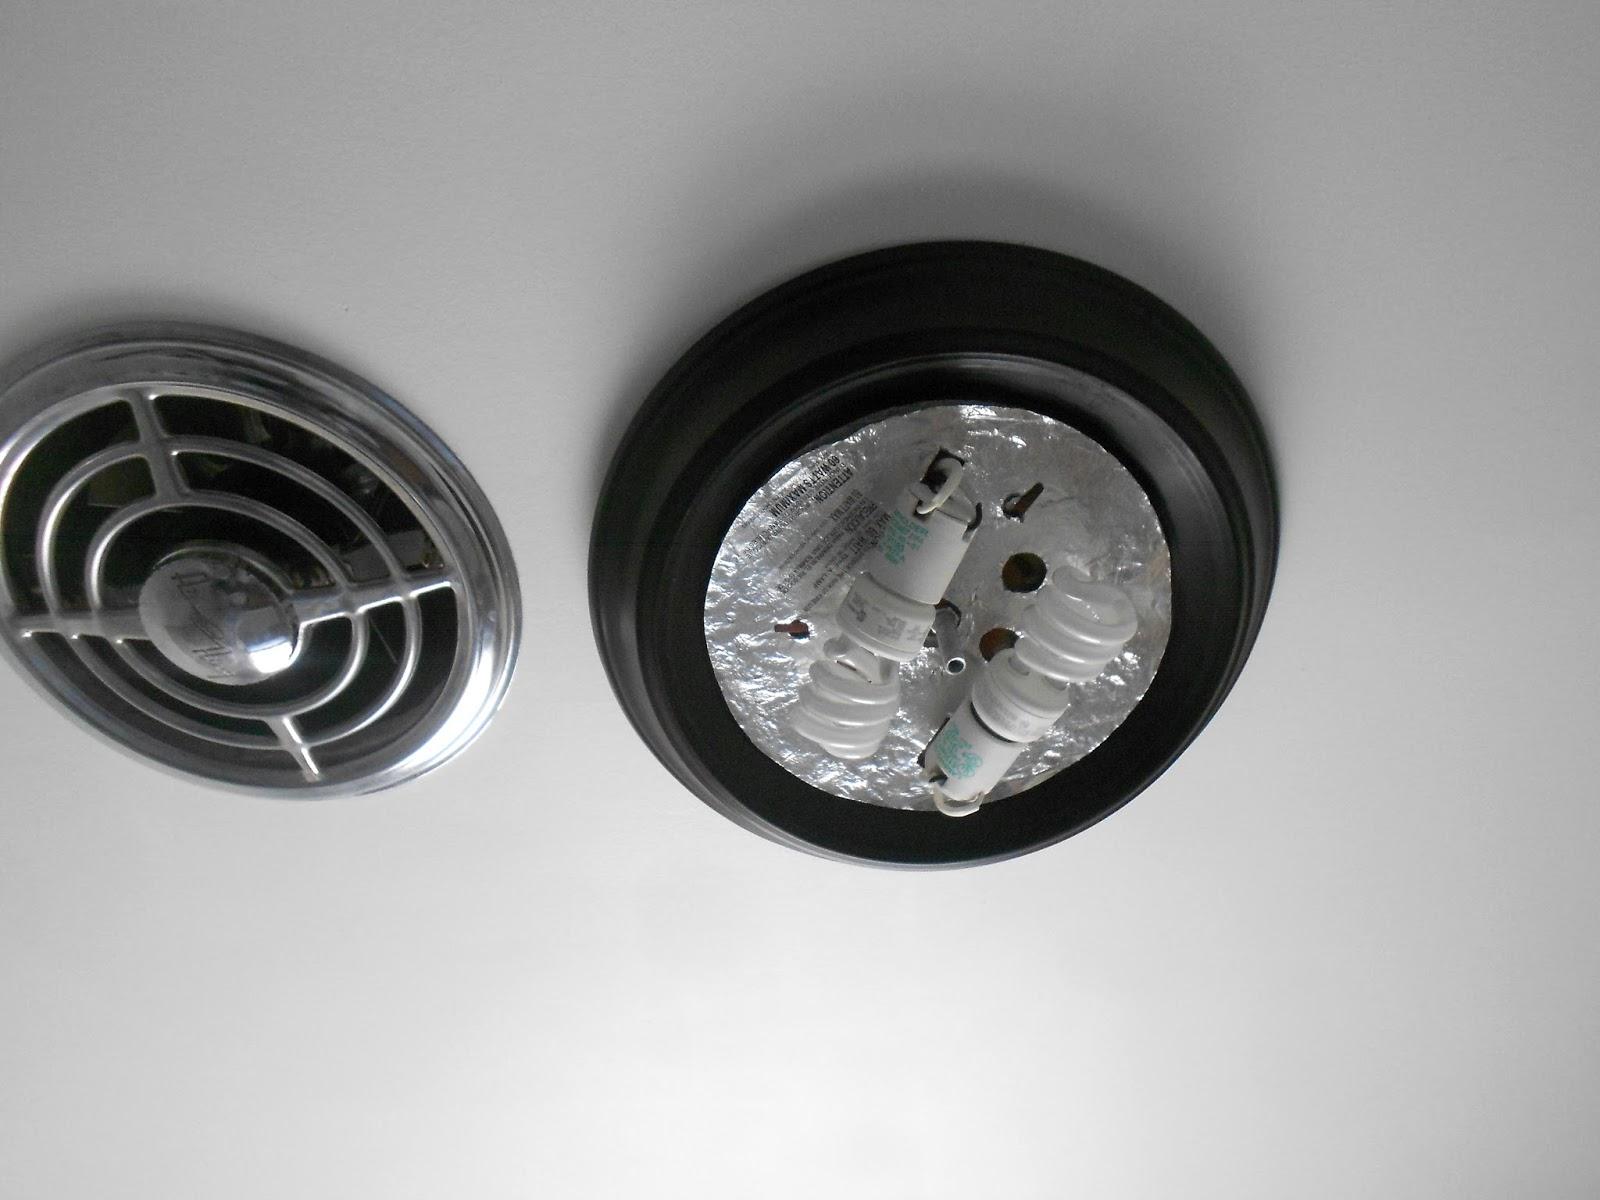 How to change bathroom light fixtureReplacement Glass For Bathroom Light Fixture Switching Out The  . Repair Bathroom Light Fixture. Home Design Ideas